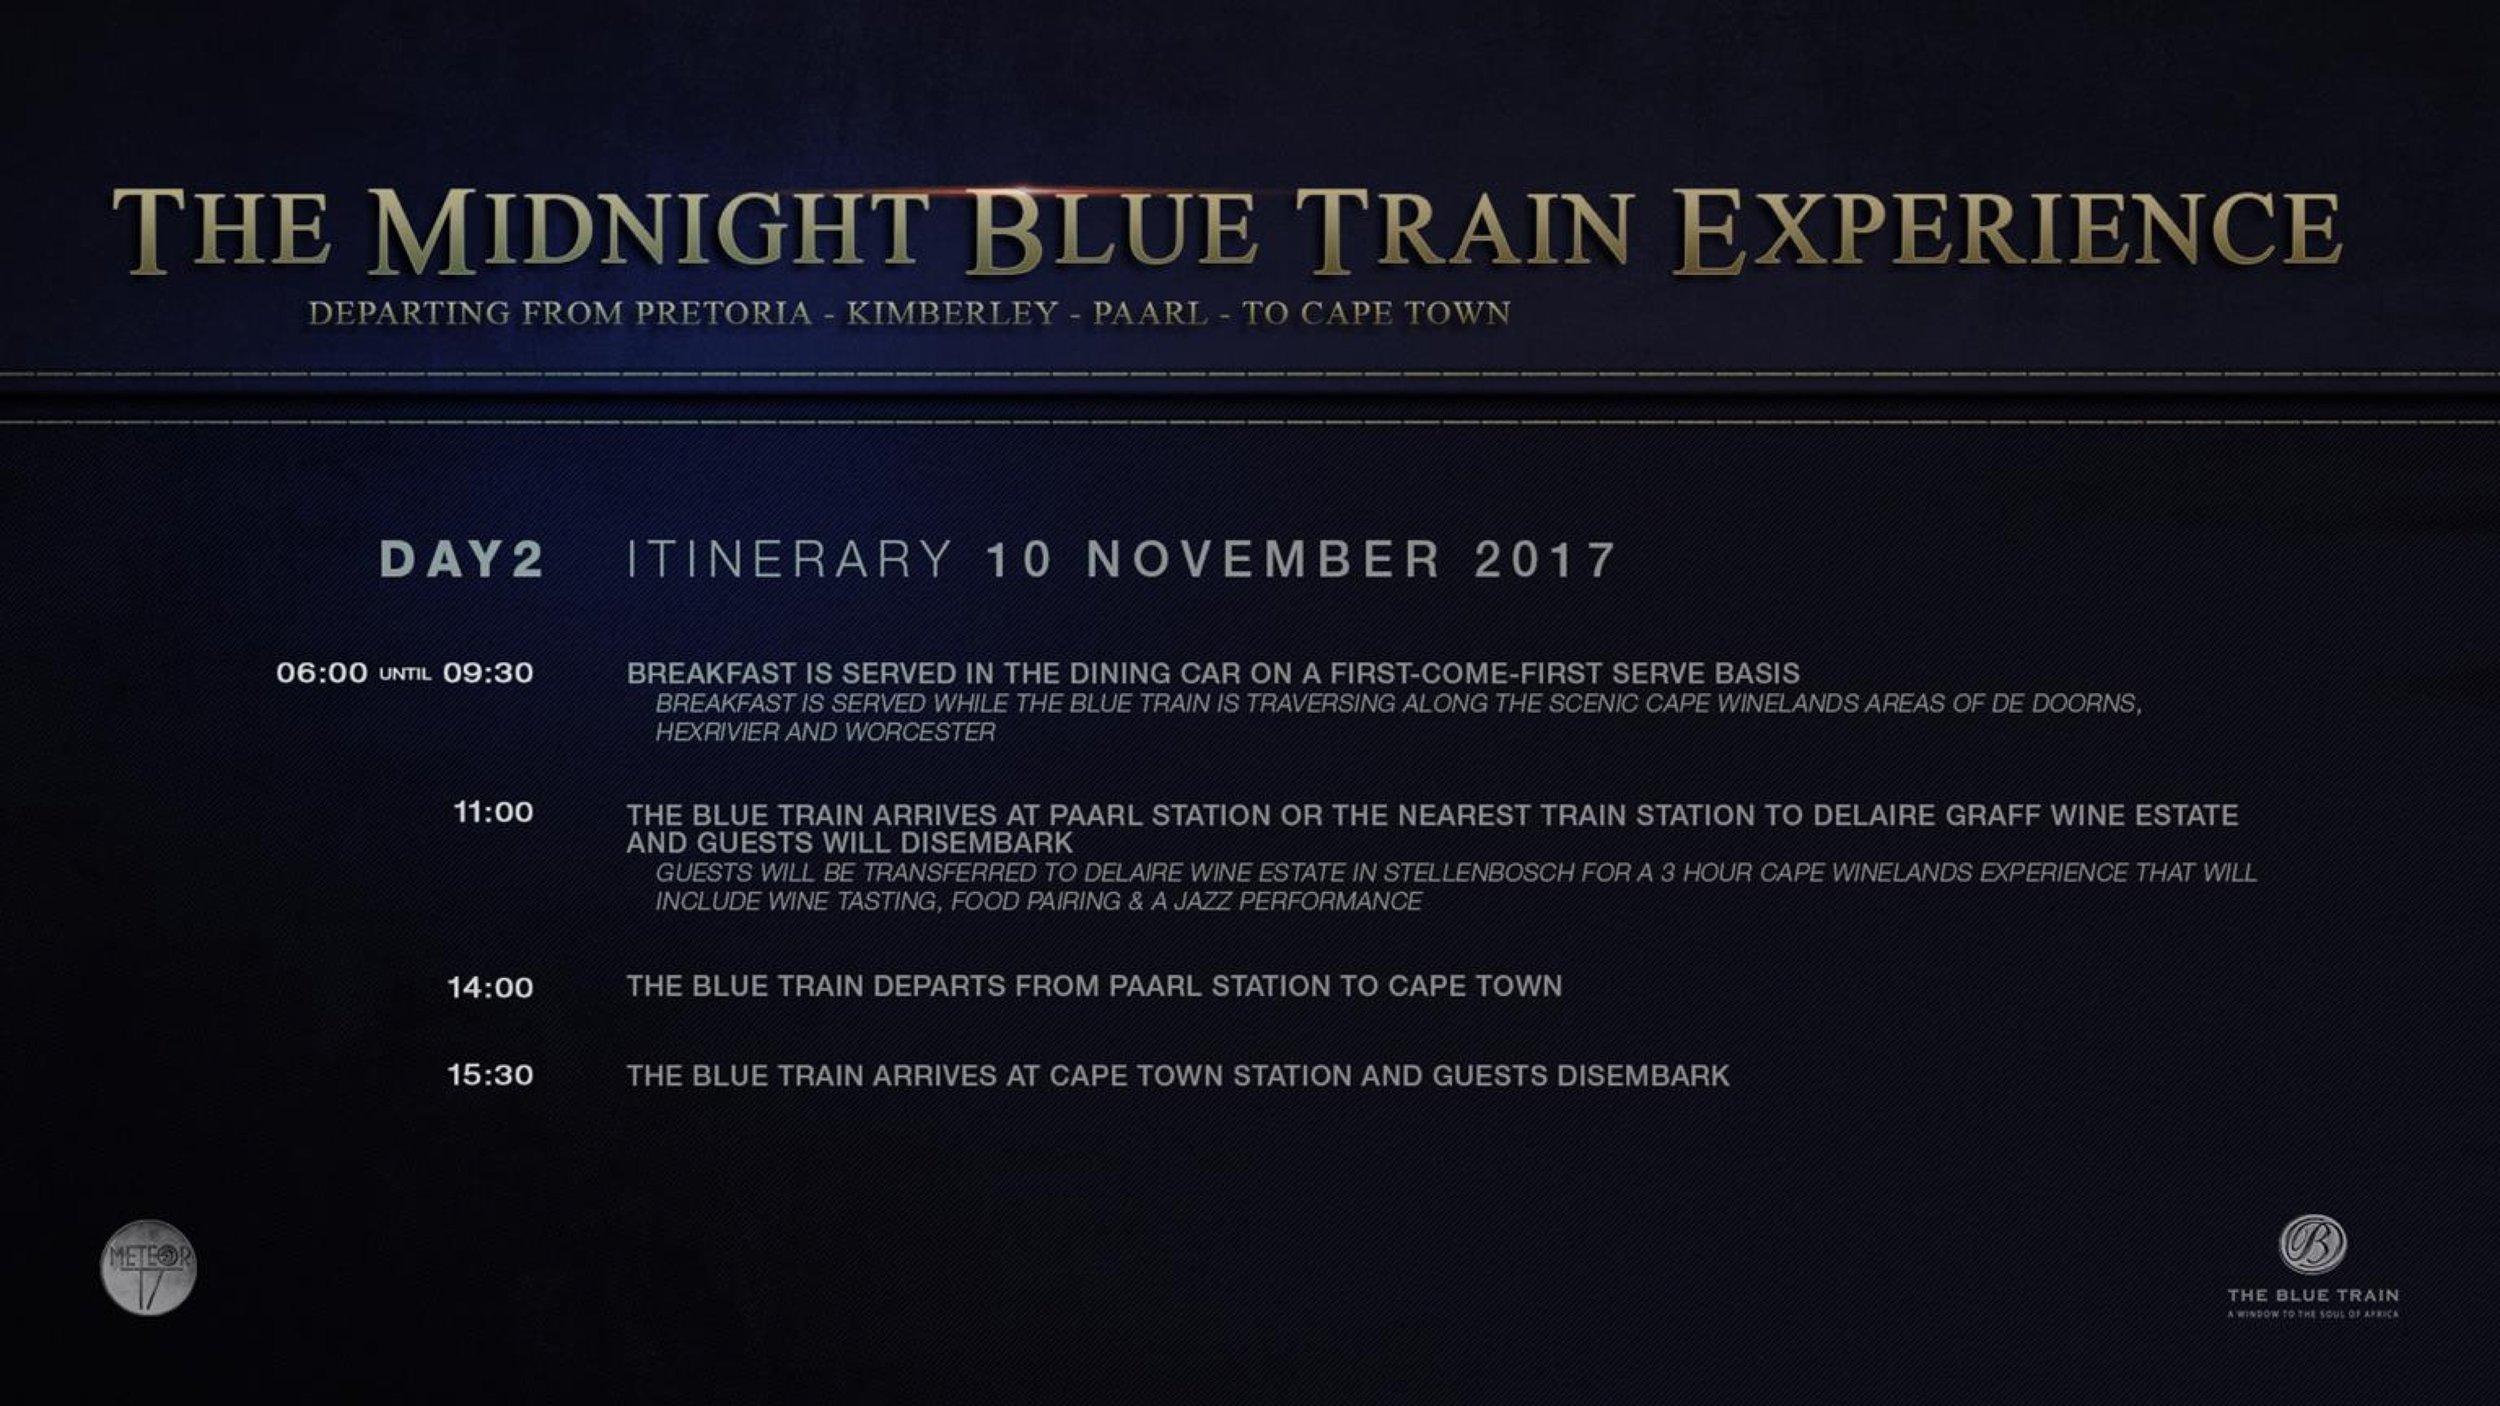 Midnight Blue Train *Transnet M17 updated deck 3 30.jpeg